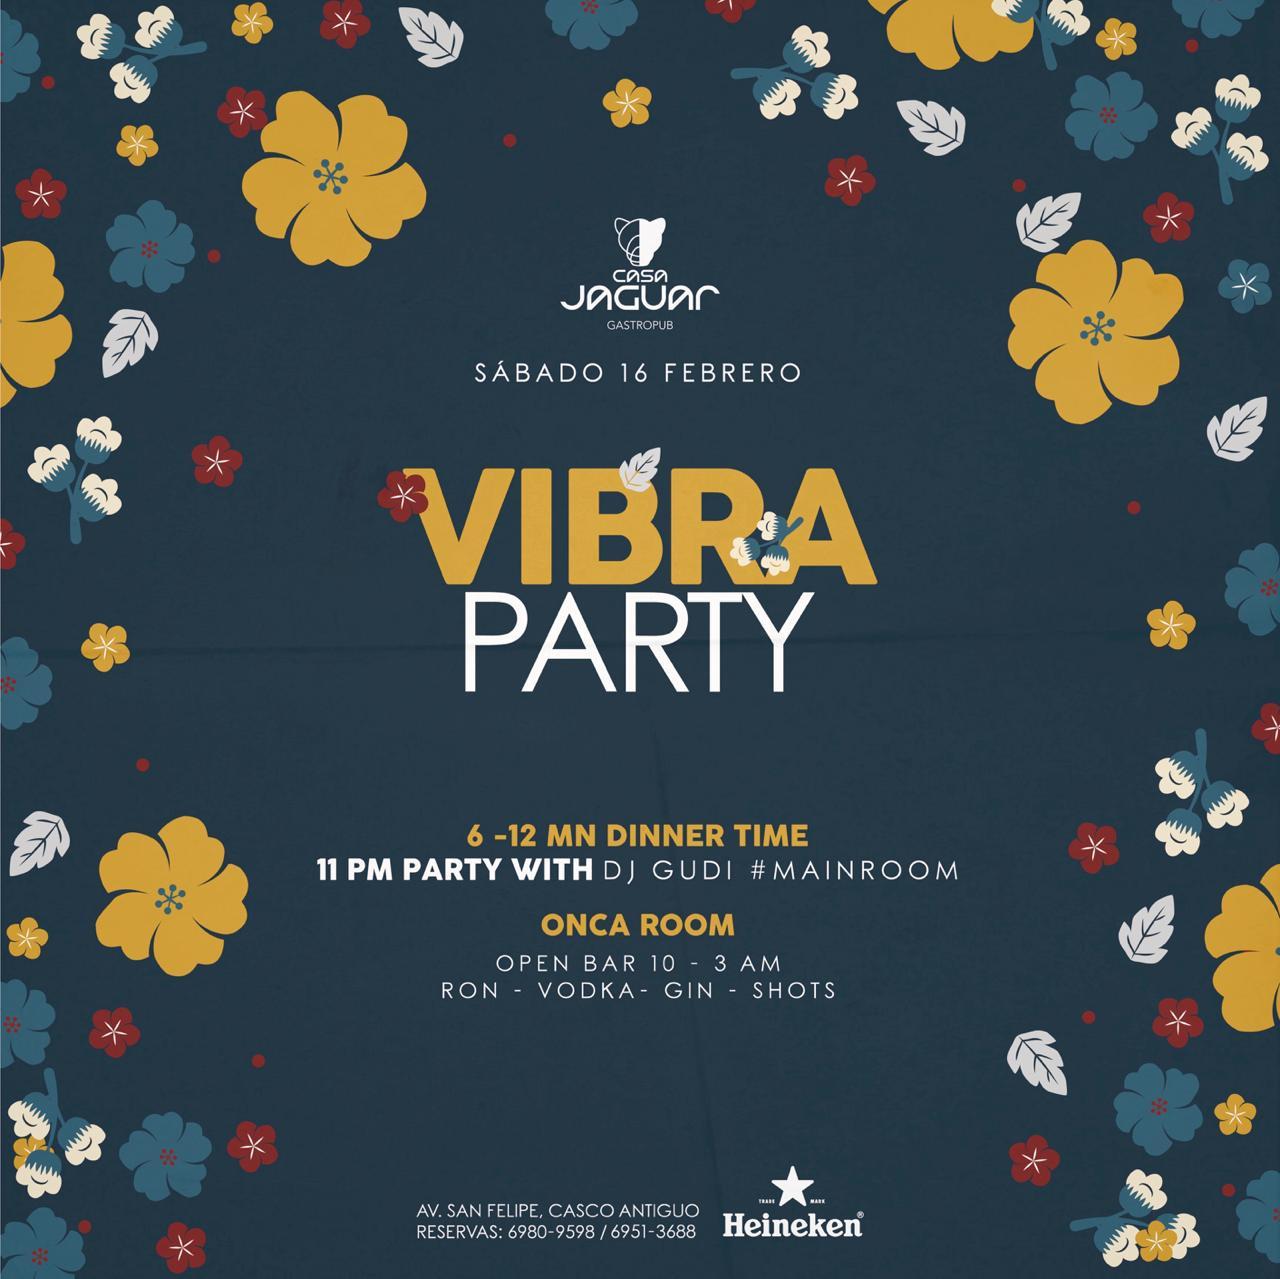 Vibra Party